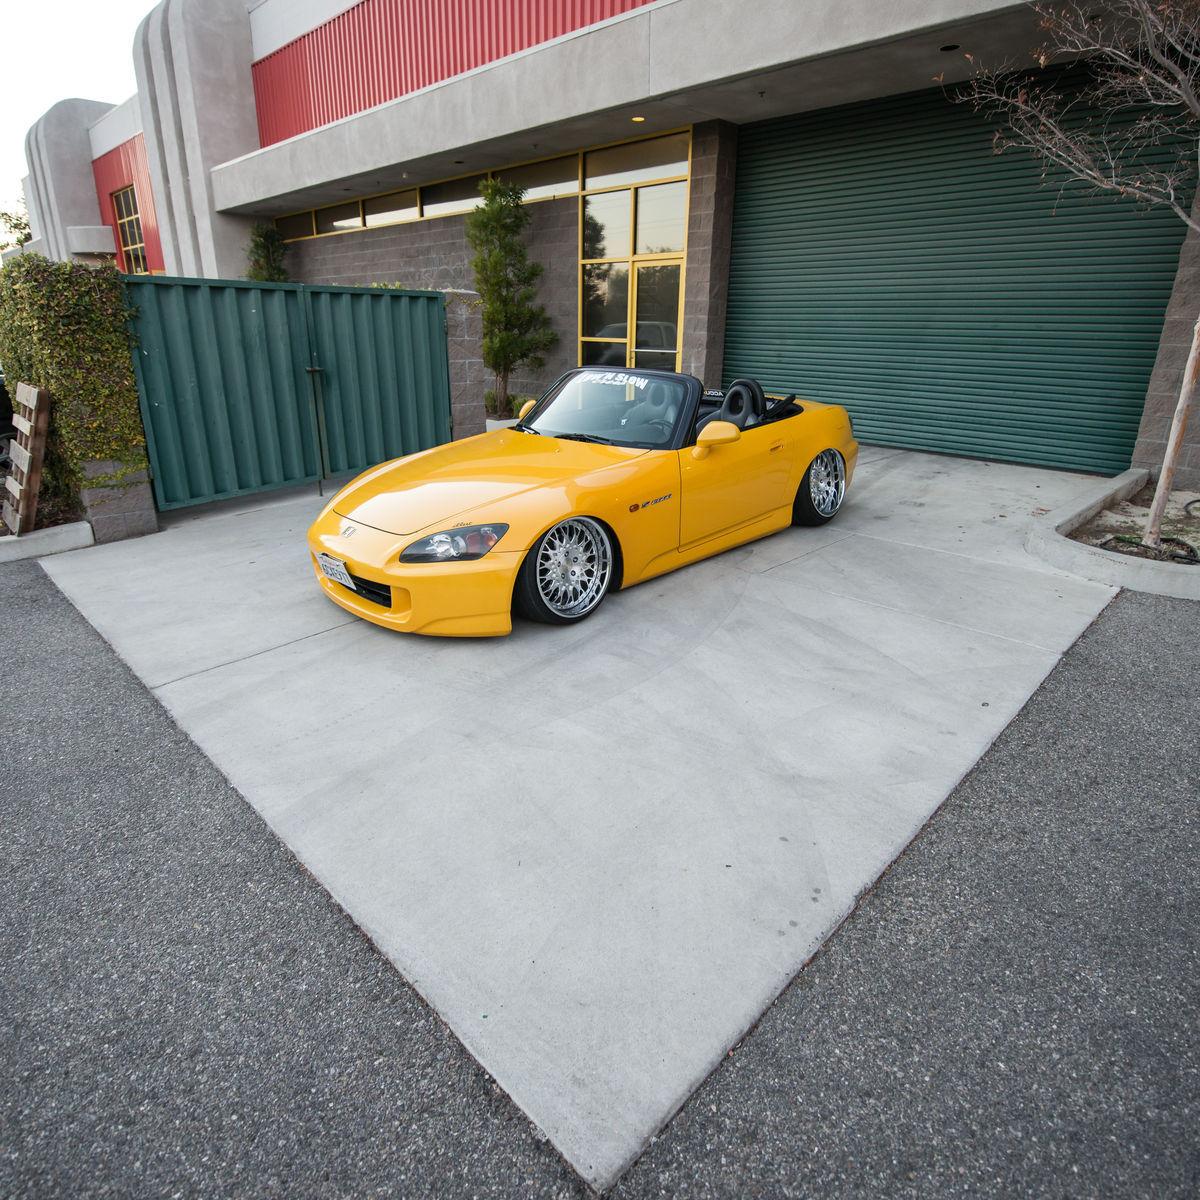 2003 Honda S2000 | S2000